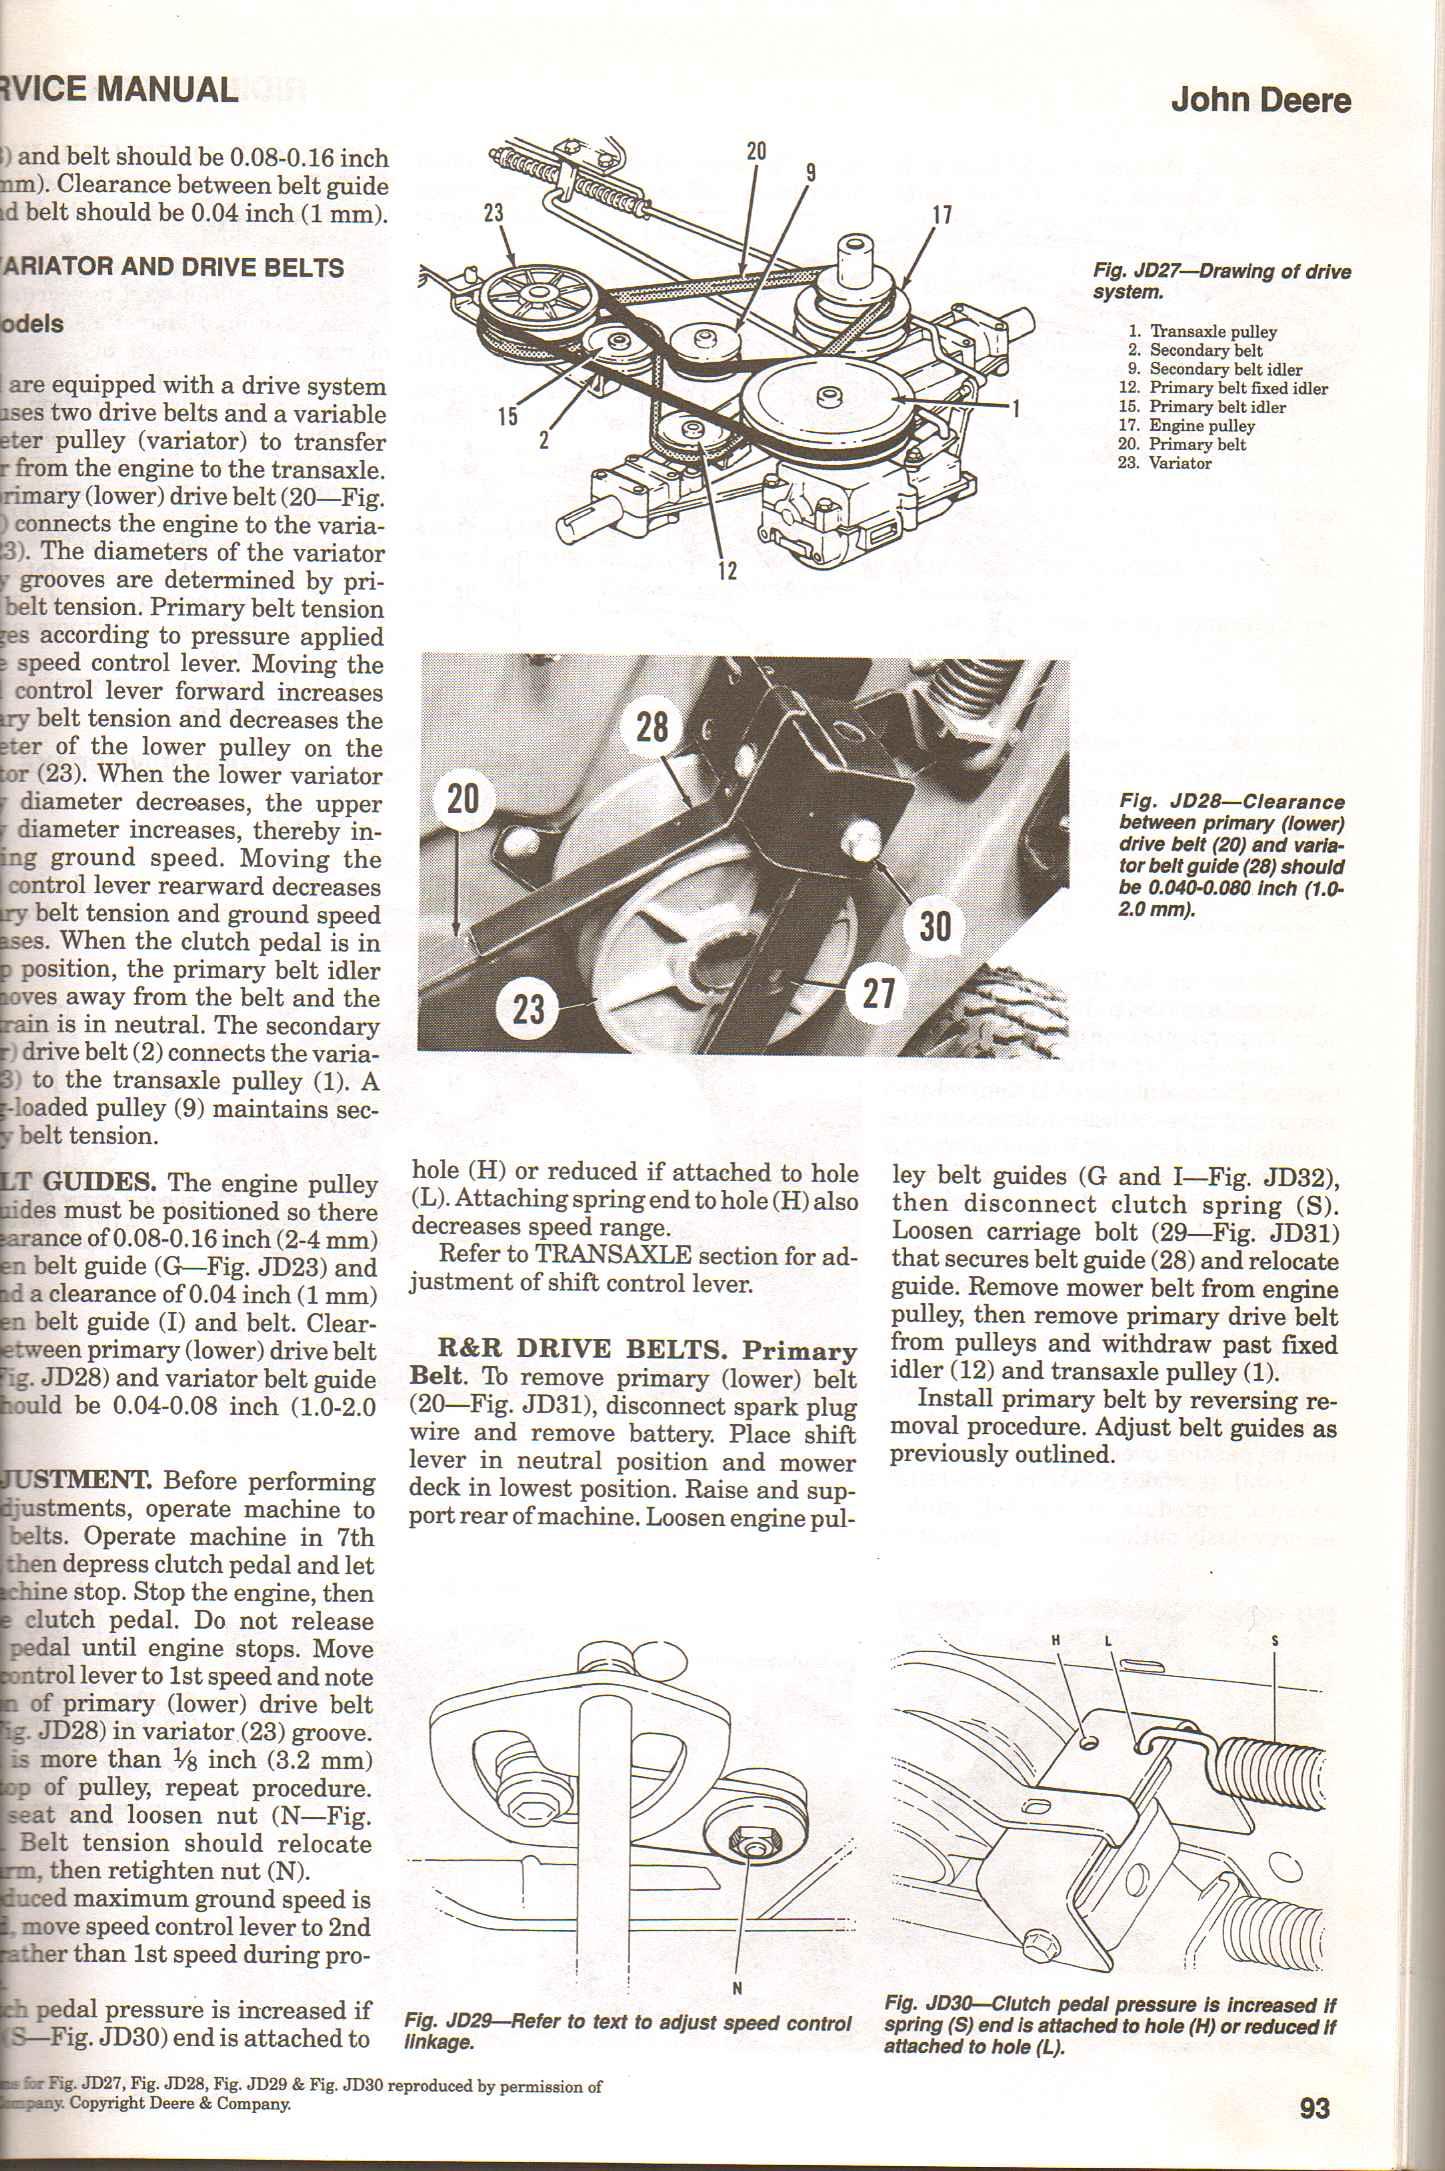 X Inacceldeepmowerdeck moreover Deere Rx Belts further Mia as well Media in addition Tm. on john deere mower engine diagram